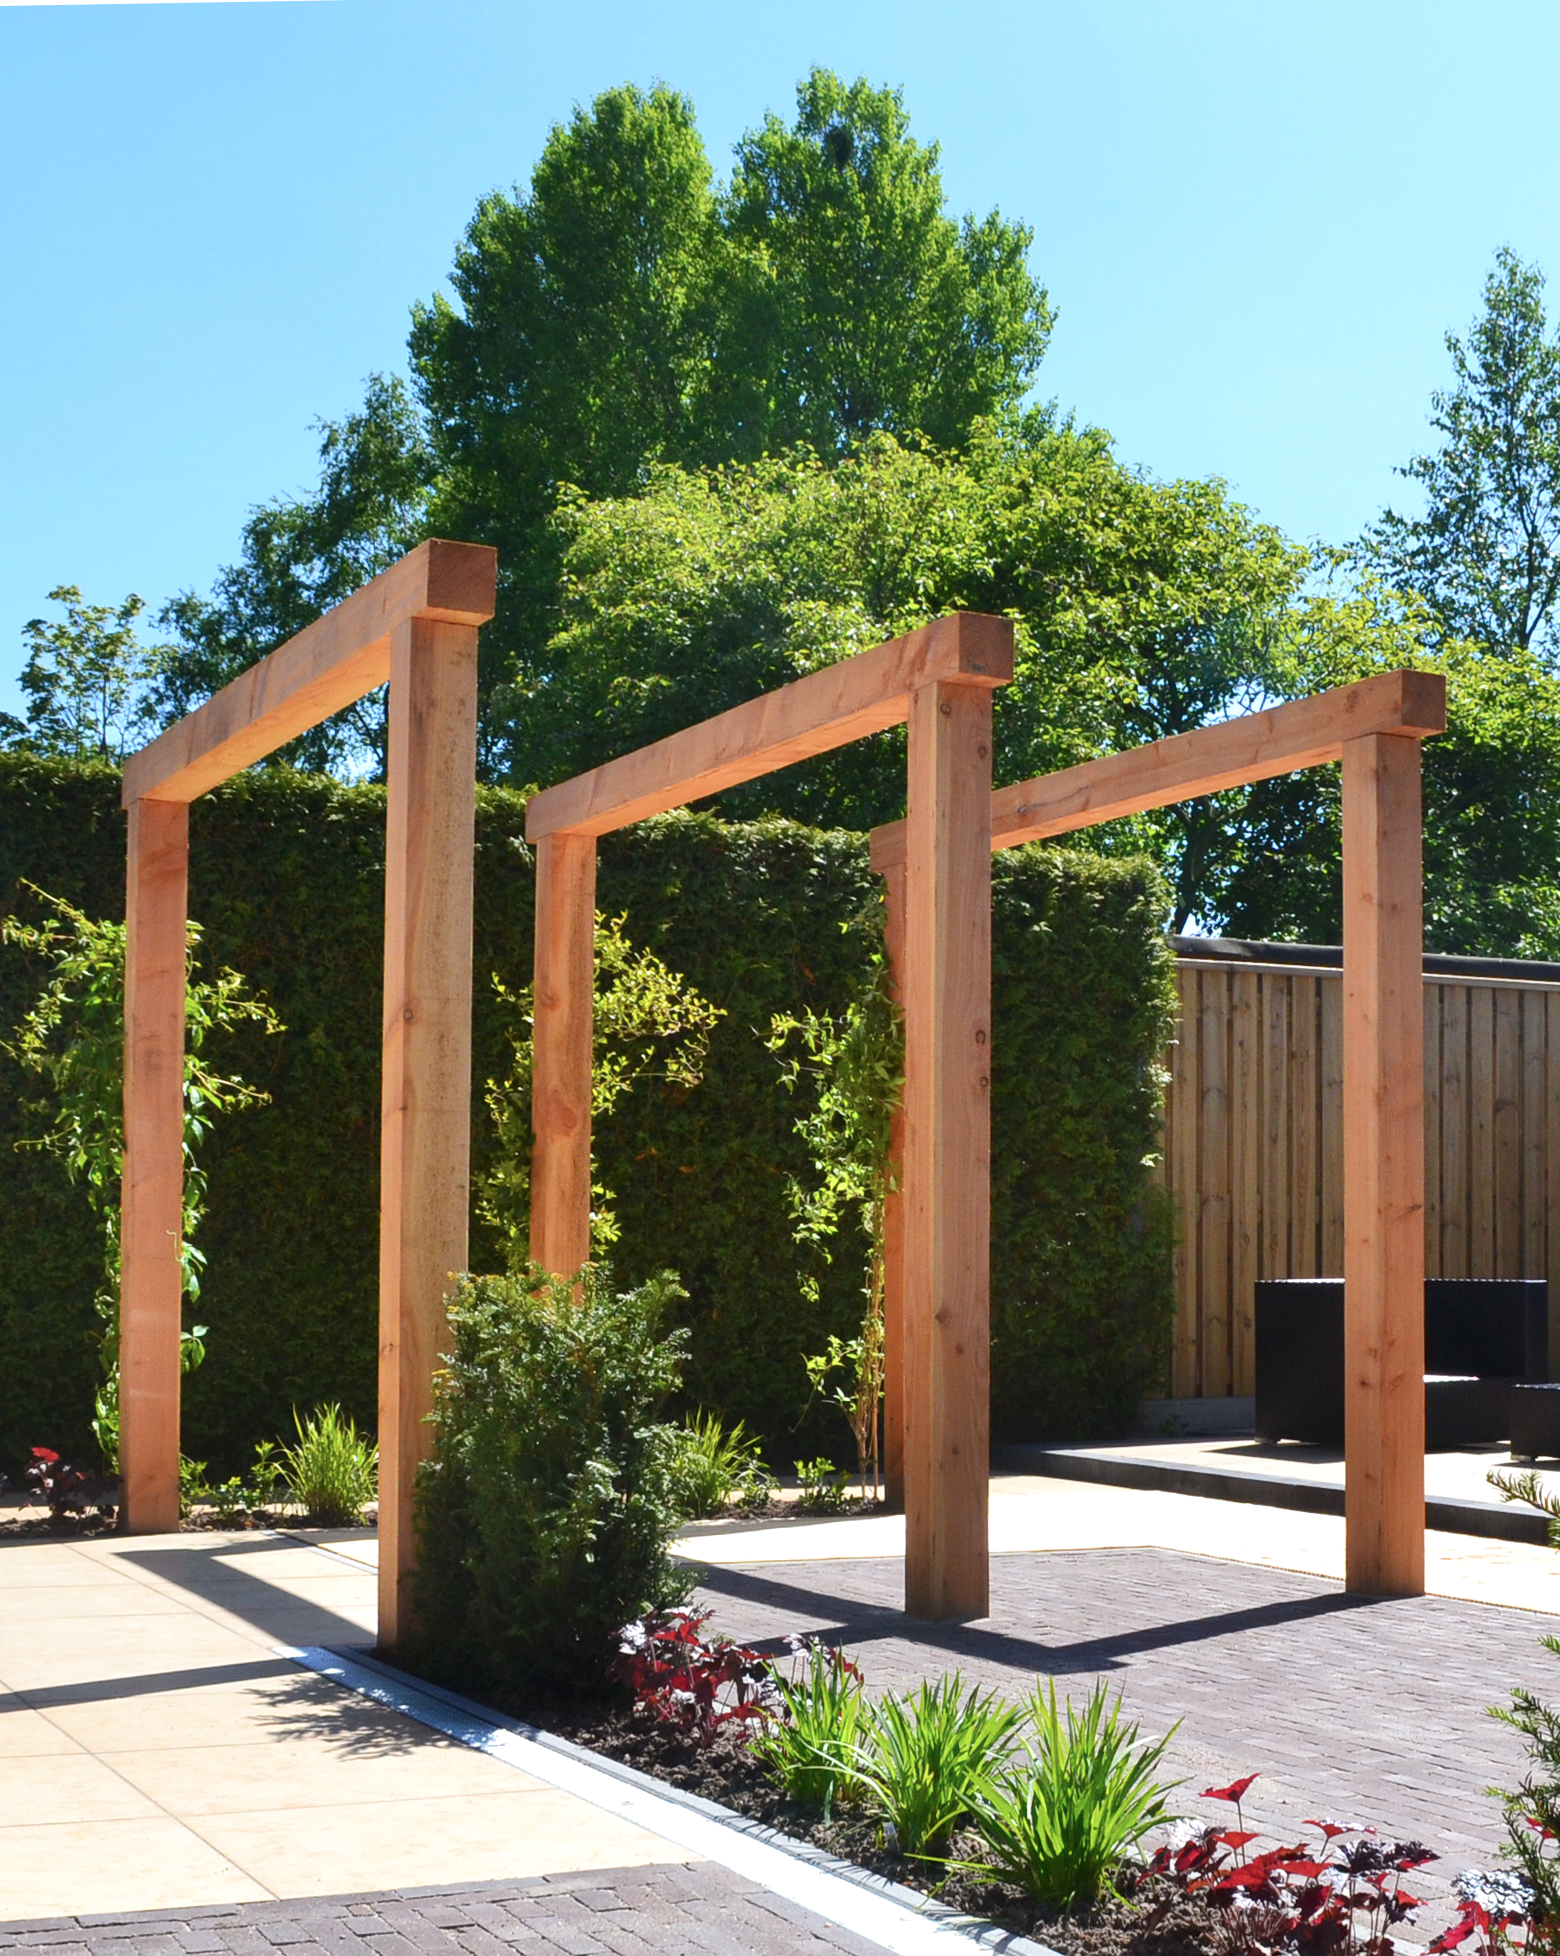 houten pergola van lariks douglas hout in moderne tuin tuin in 2019 pinterest tuin tuin. Black Bedroom Furniture Sets. Home Design Ideas